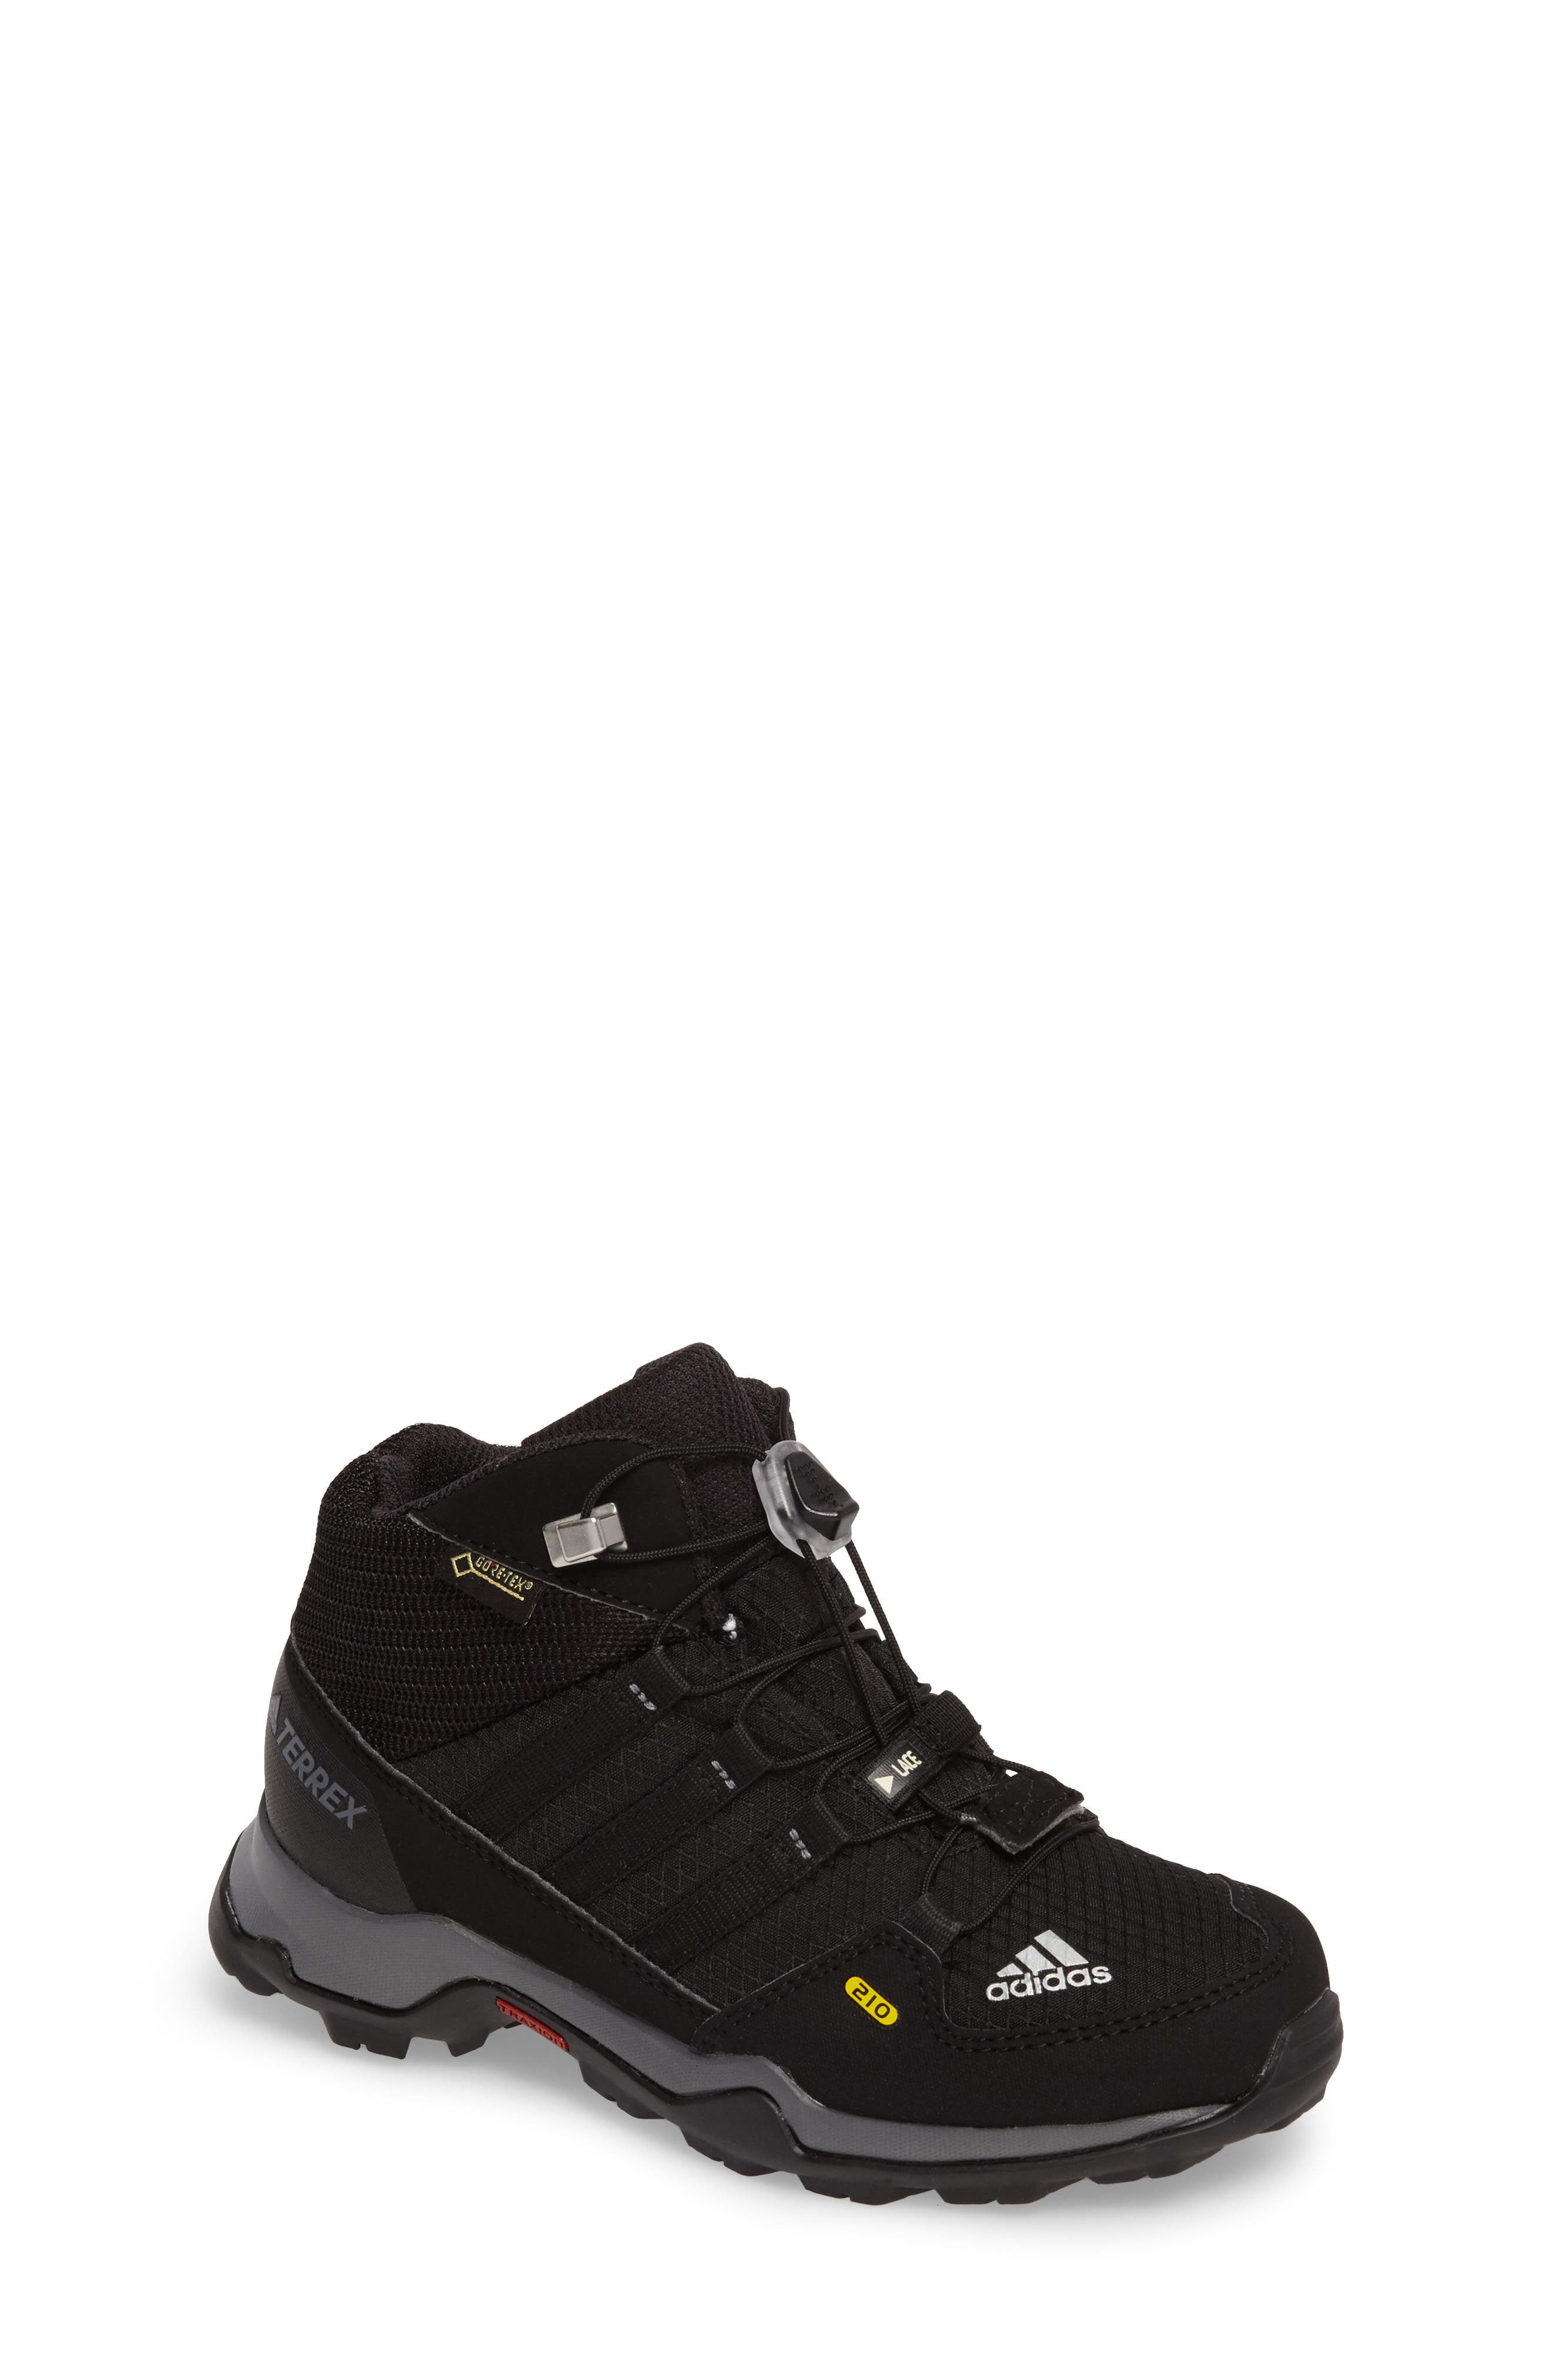 Terrex Mid Gore-Tex<sup>®</sup> Insulated Waterproof Sneaker Boot,                         Main,                         color, Black/ Black/ Vista Grey